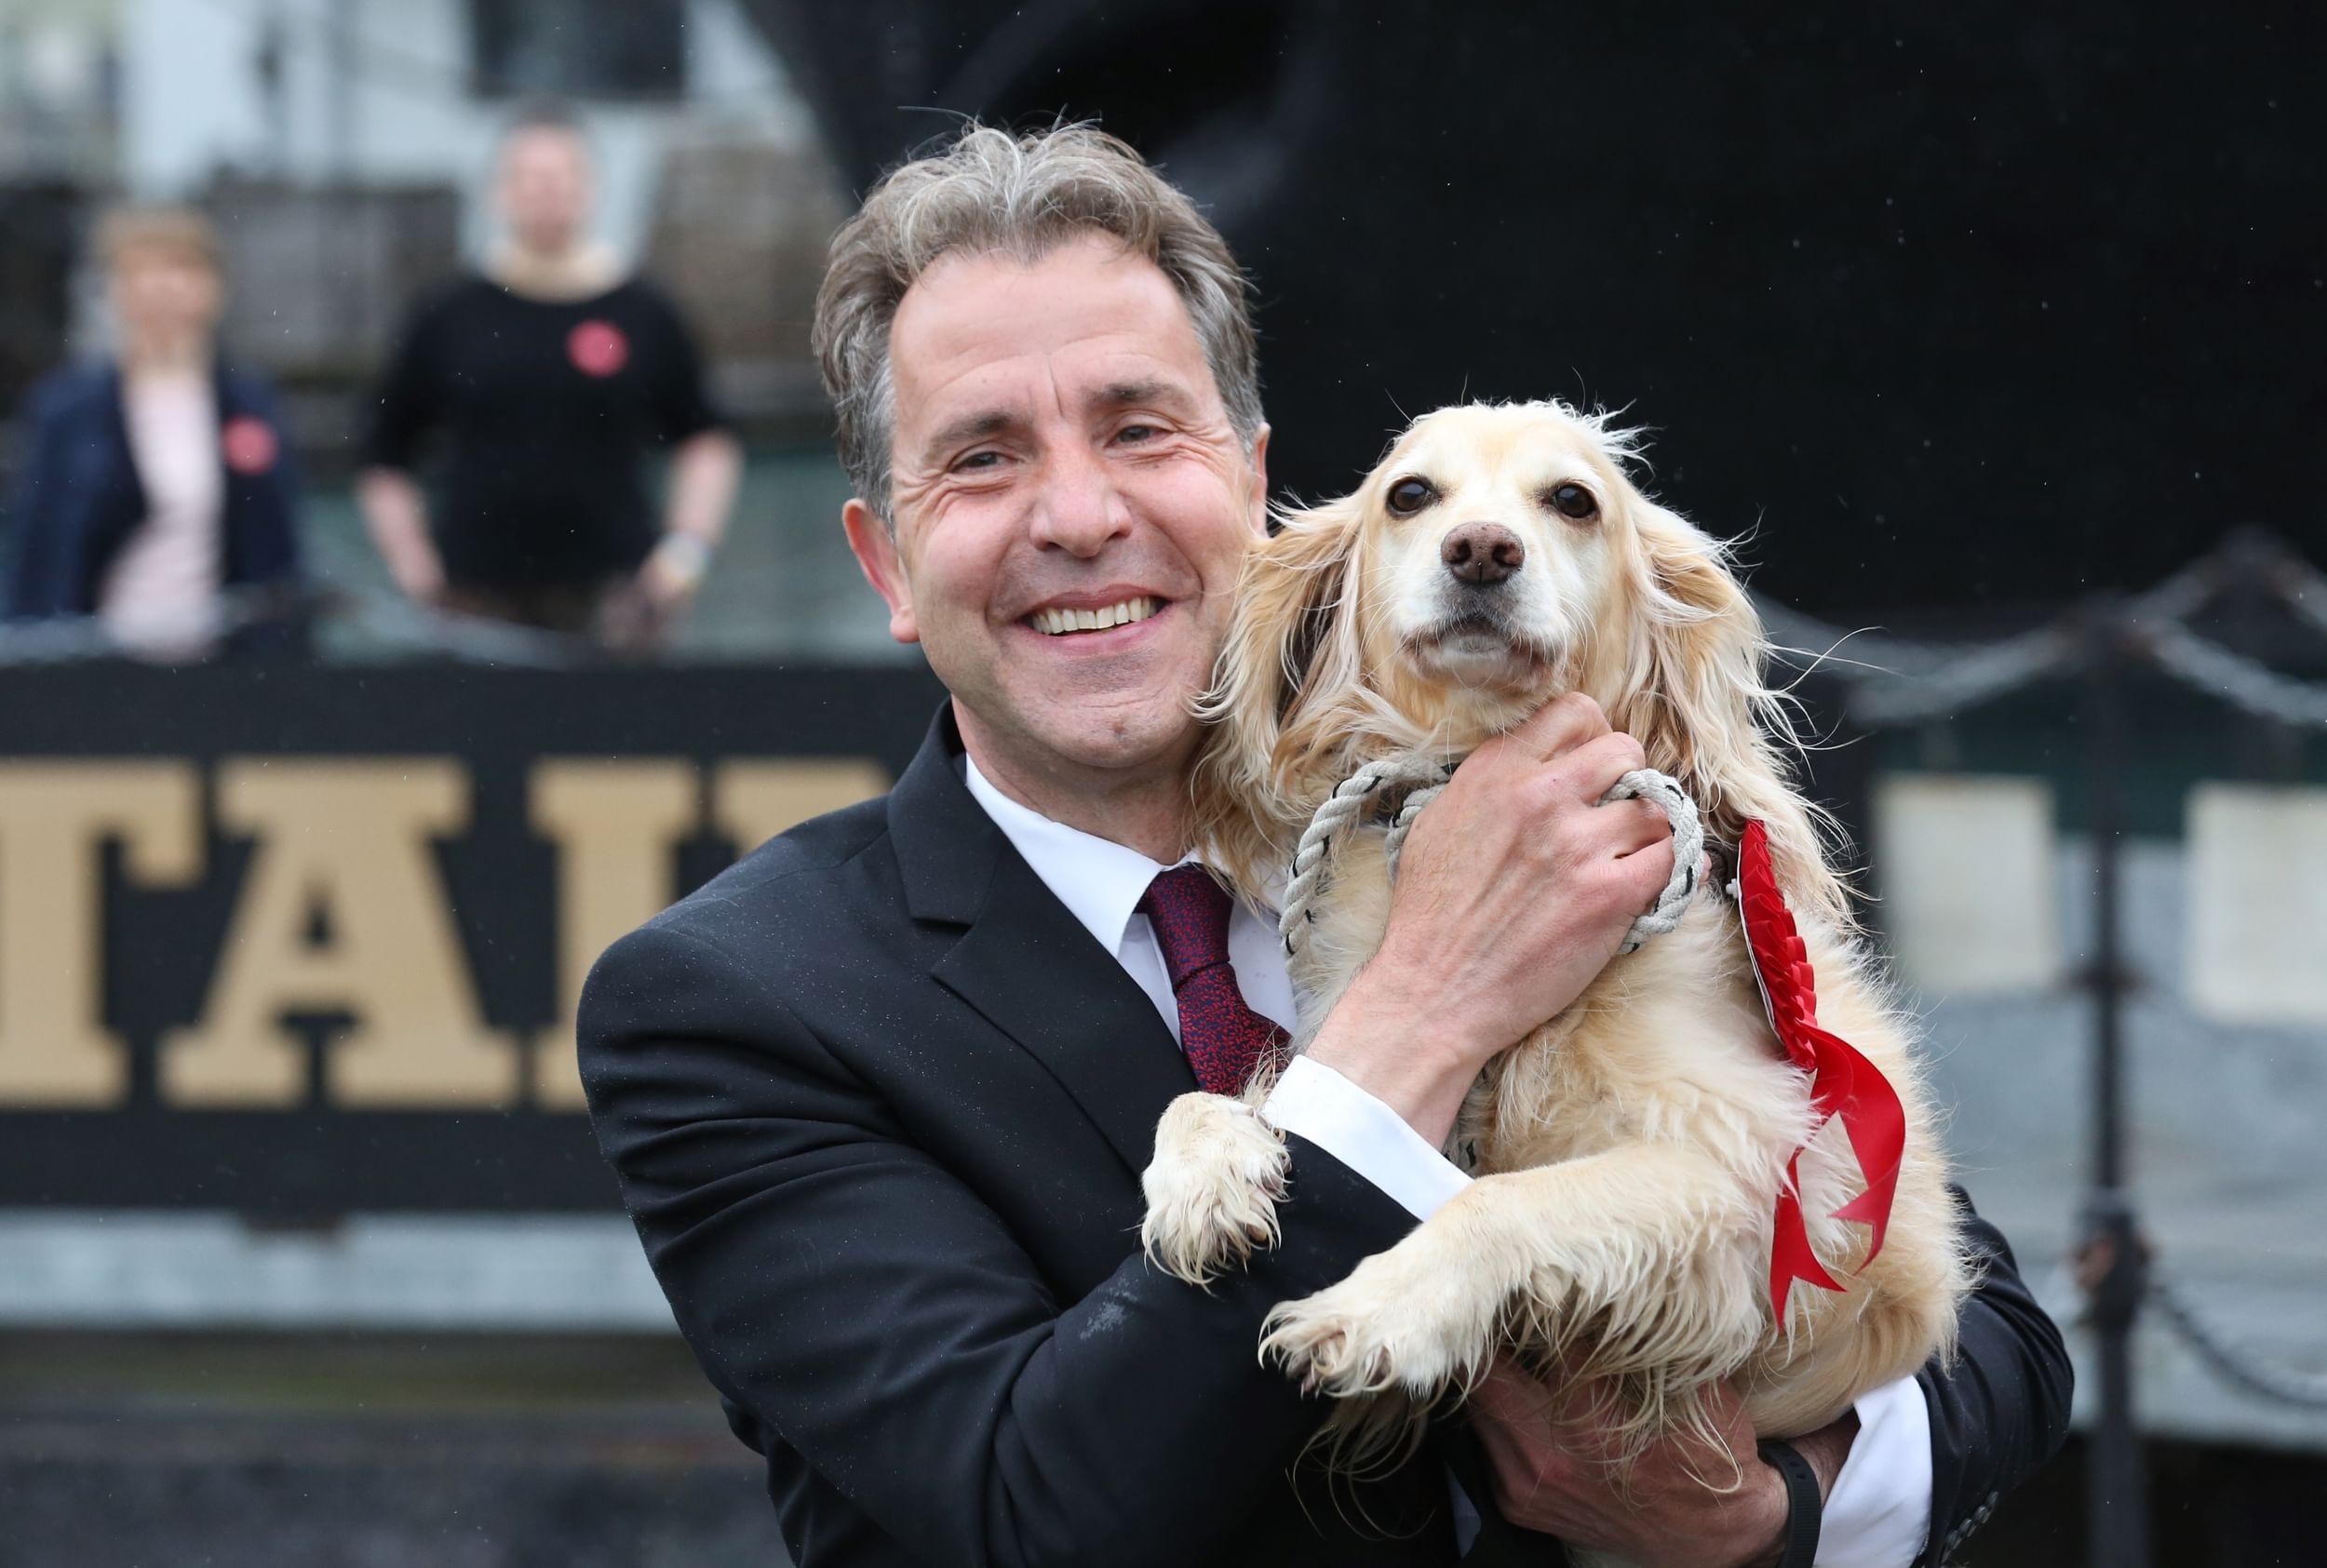 The Mayor of West of England: Dan Norris